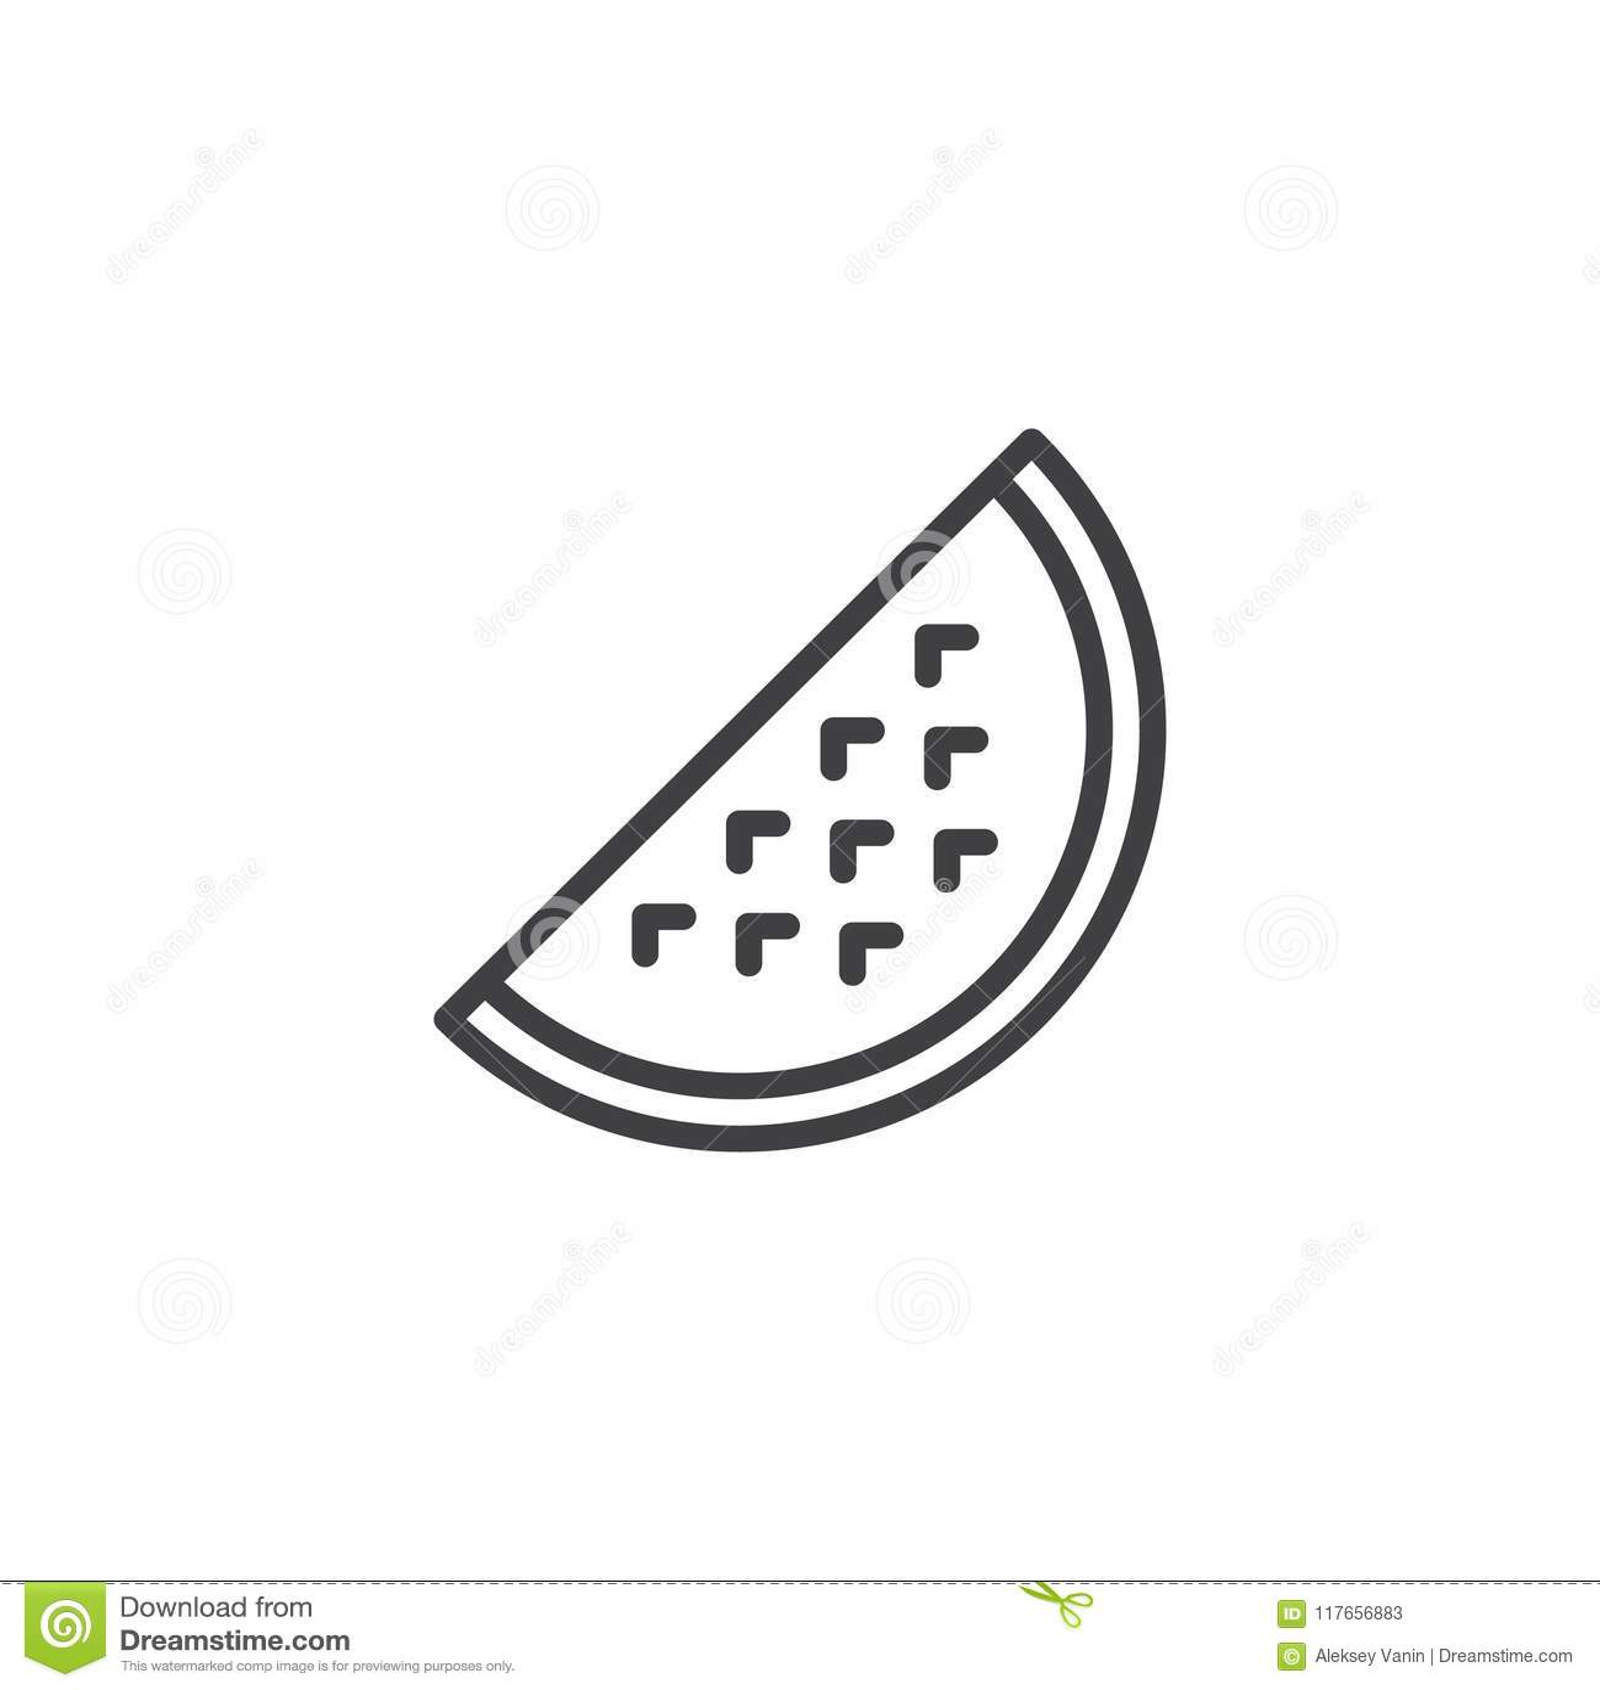 Watermelon Slice Outline Icon Stock Vector Illustration Of Single Dessert 117656883